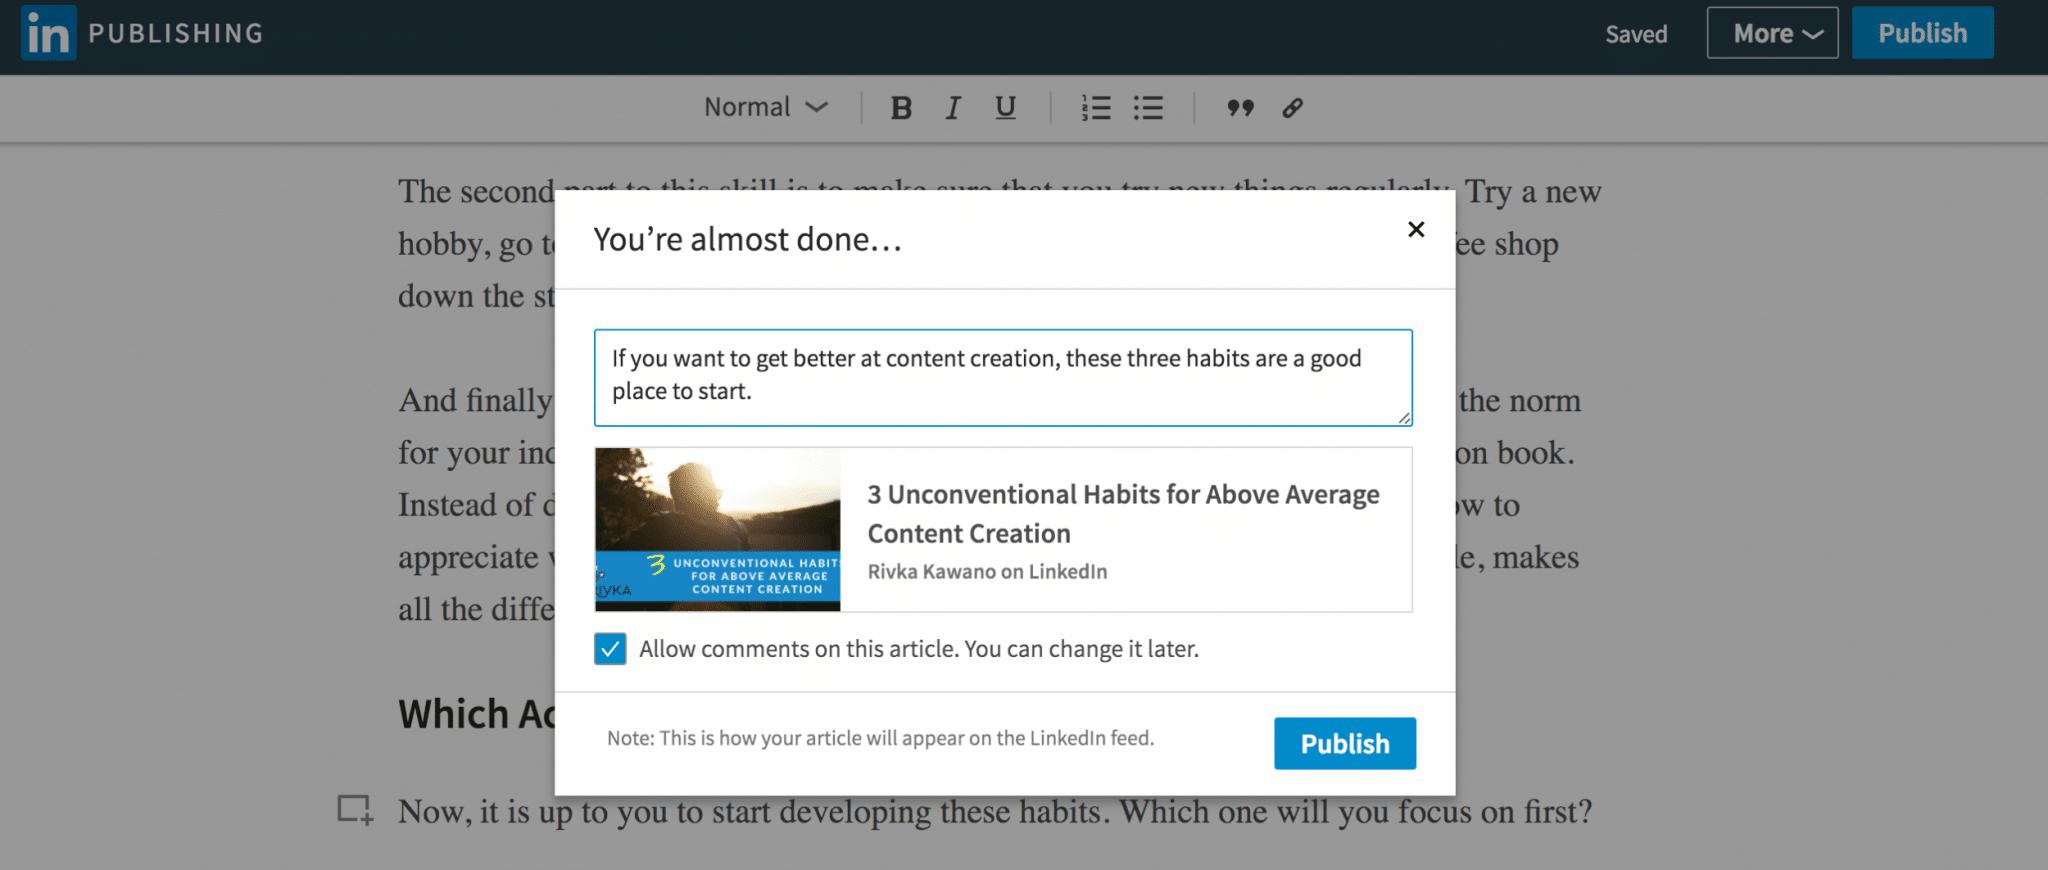 LinkedIn Publishing Tips